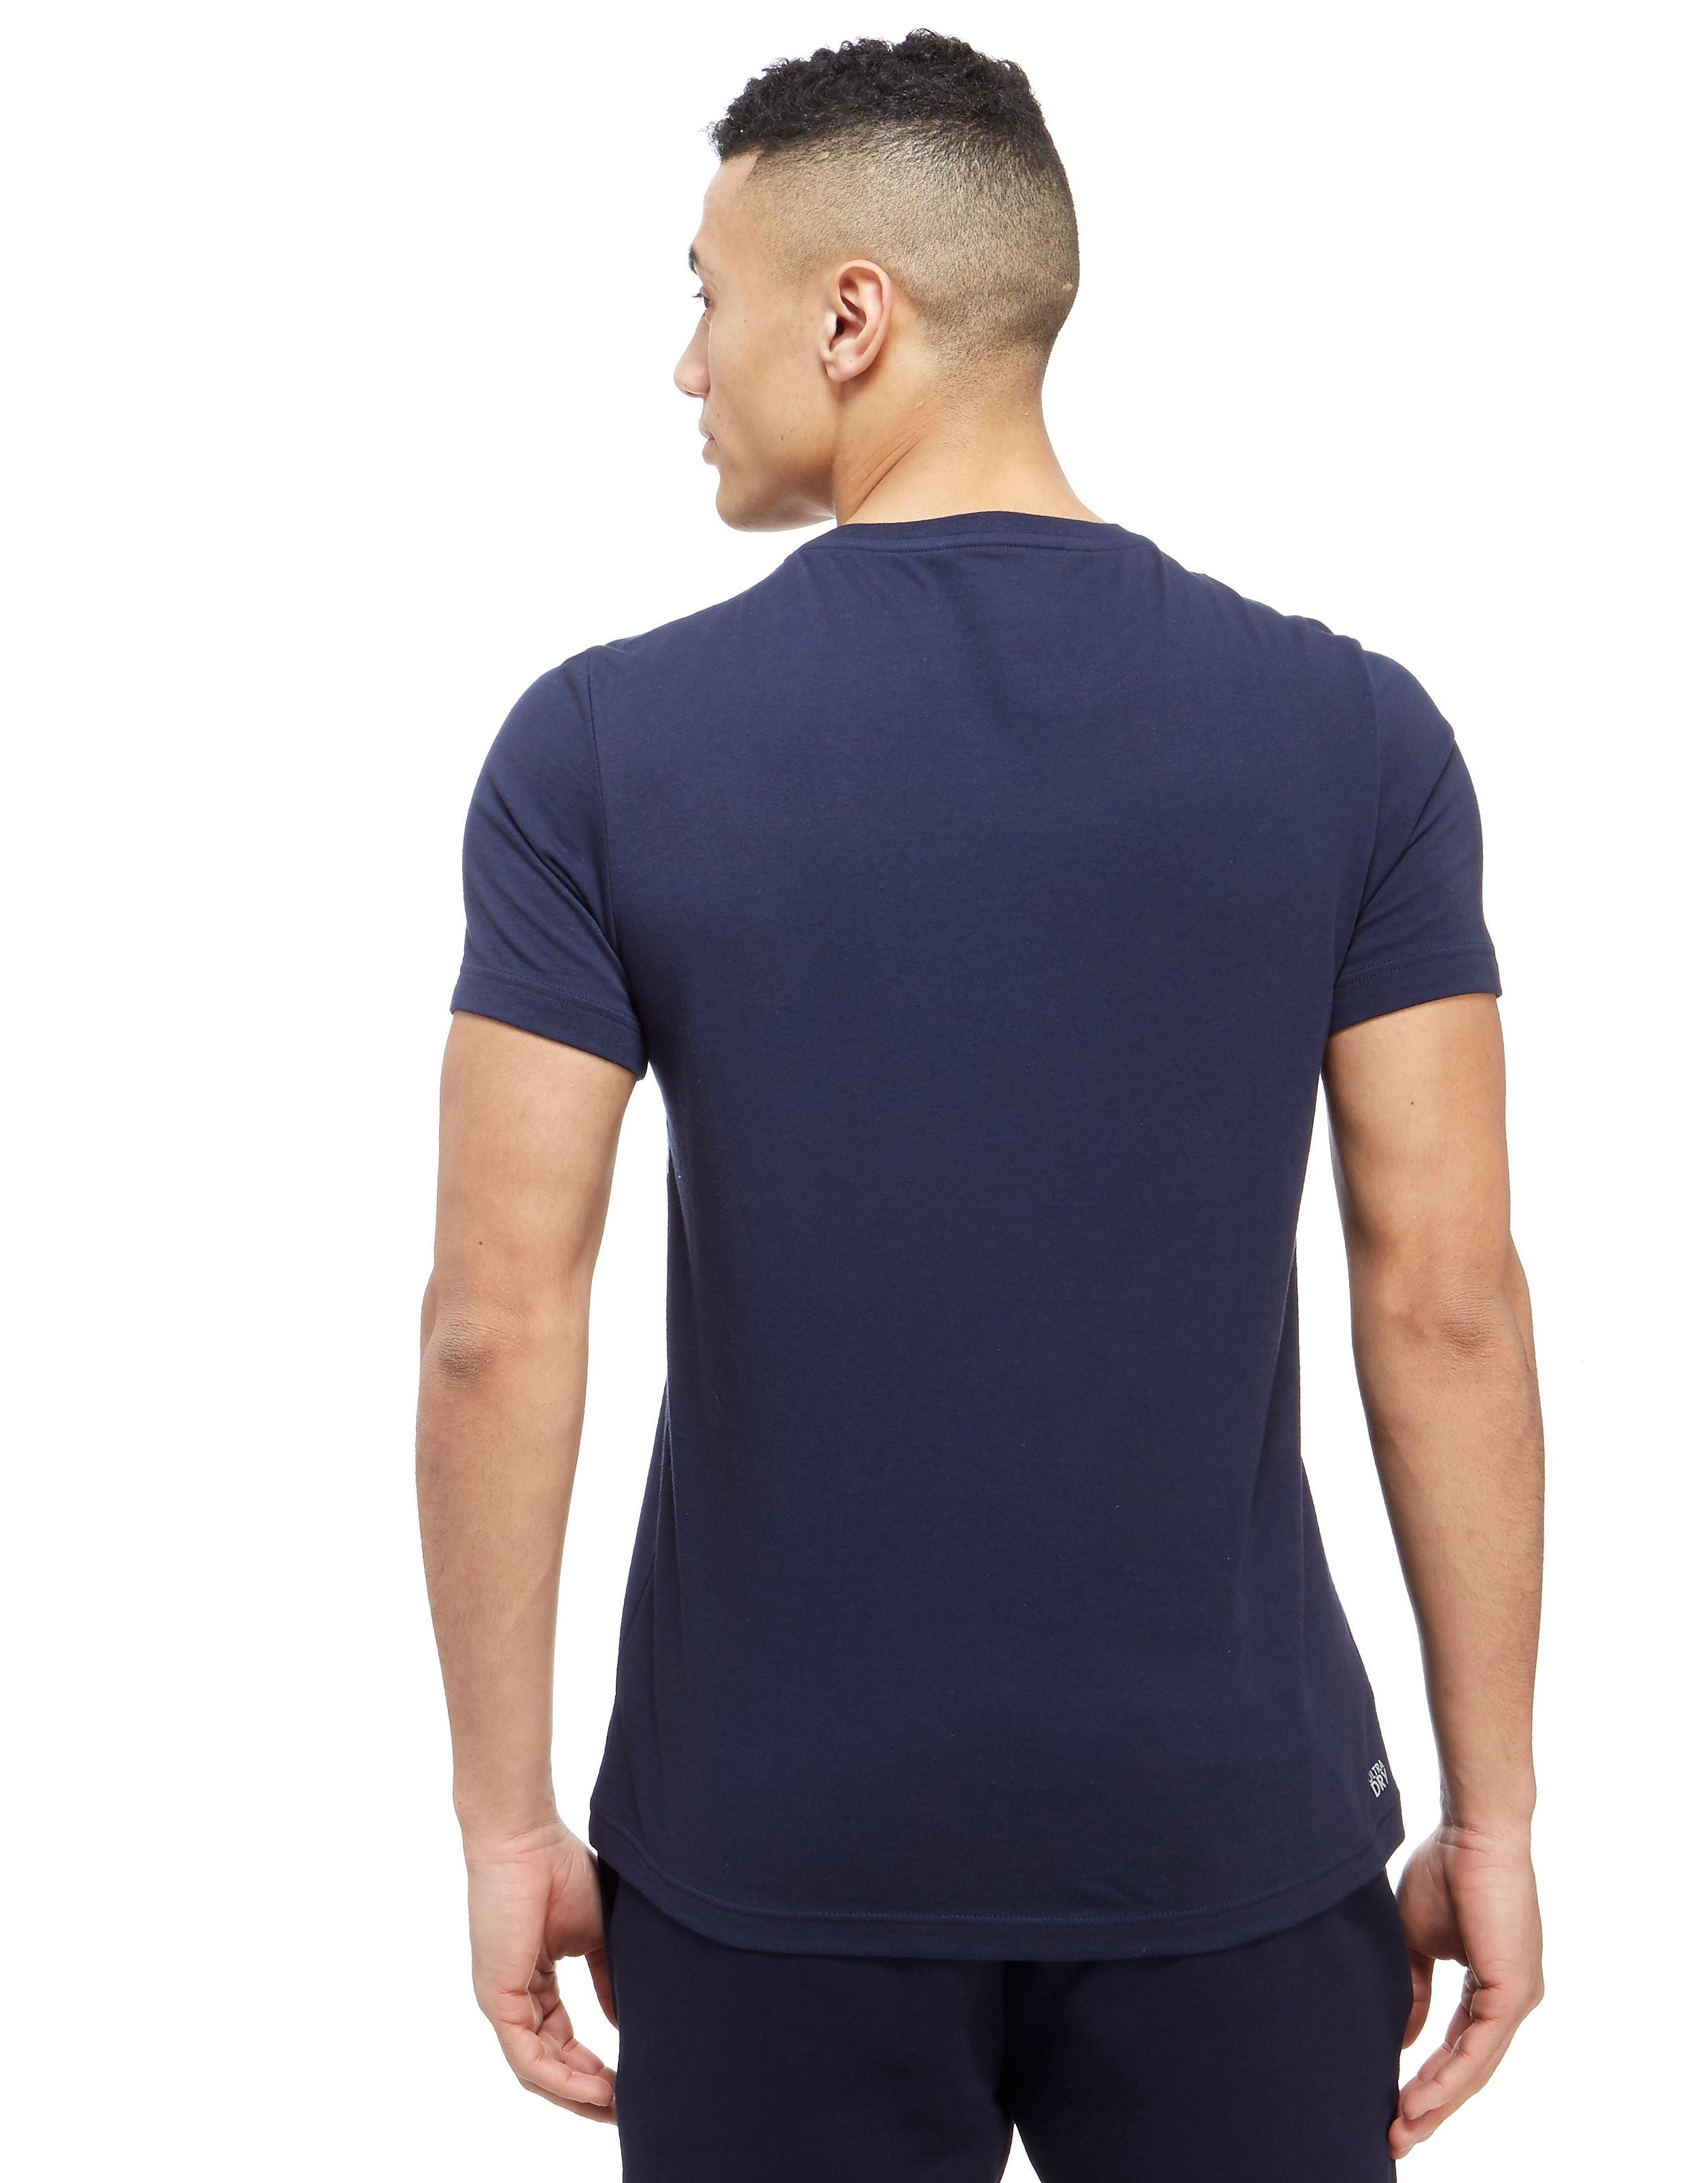 Lacoste Chest Panel T-Shirt